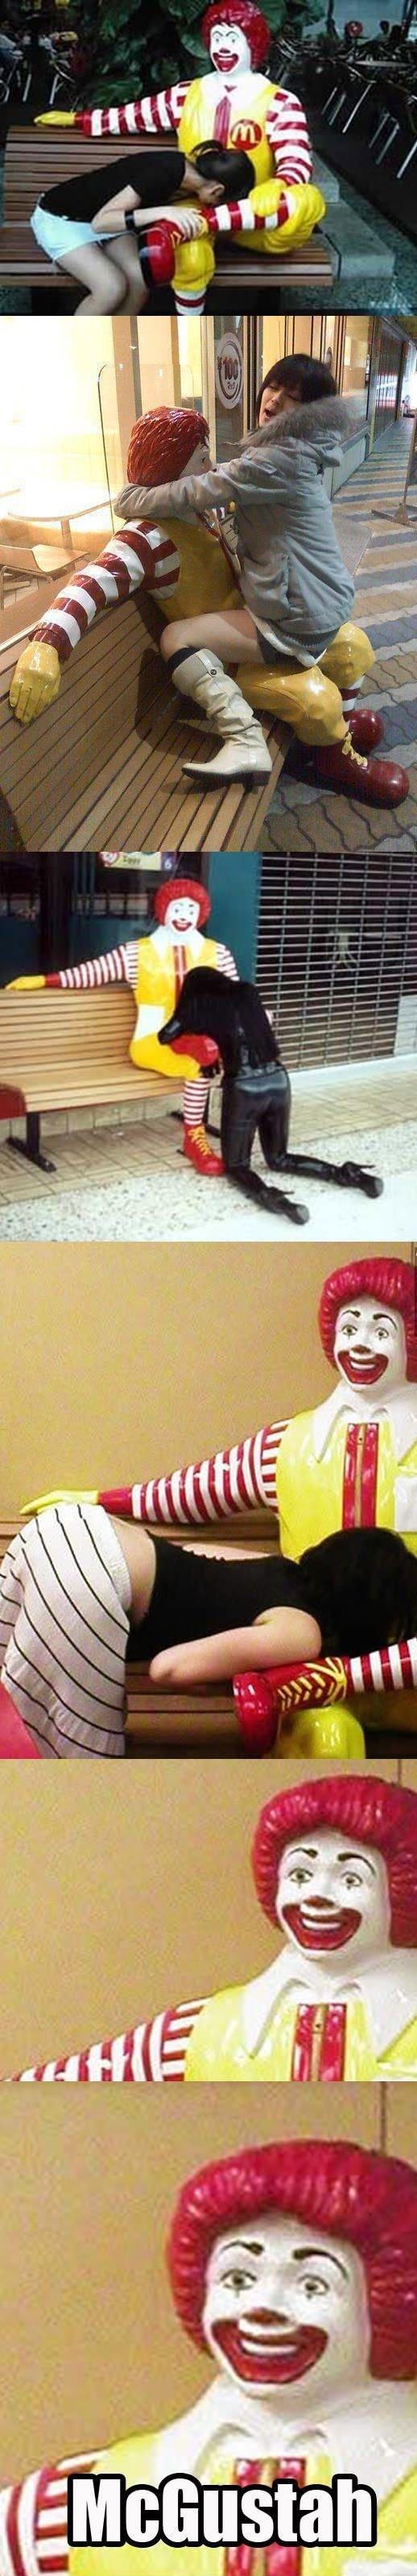 Horny Ronald. look at the joy he is having.. i came buckets asdasdasdasd